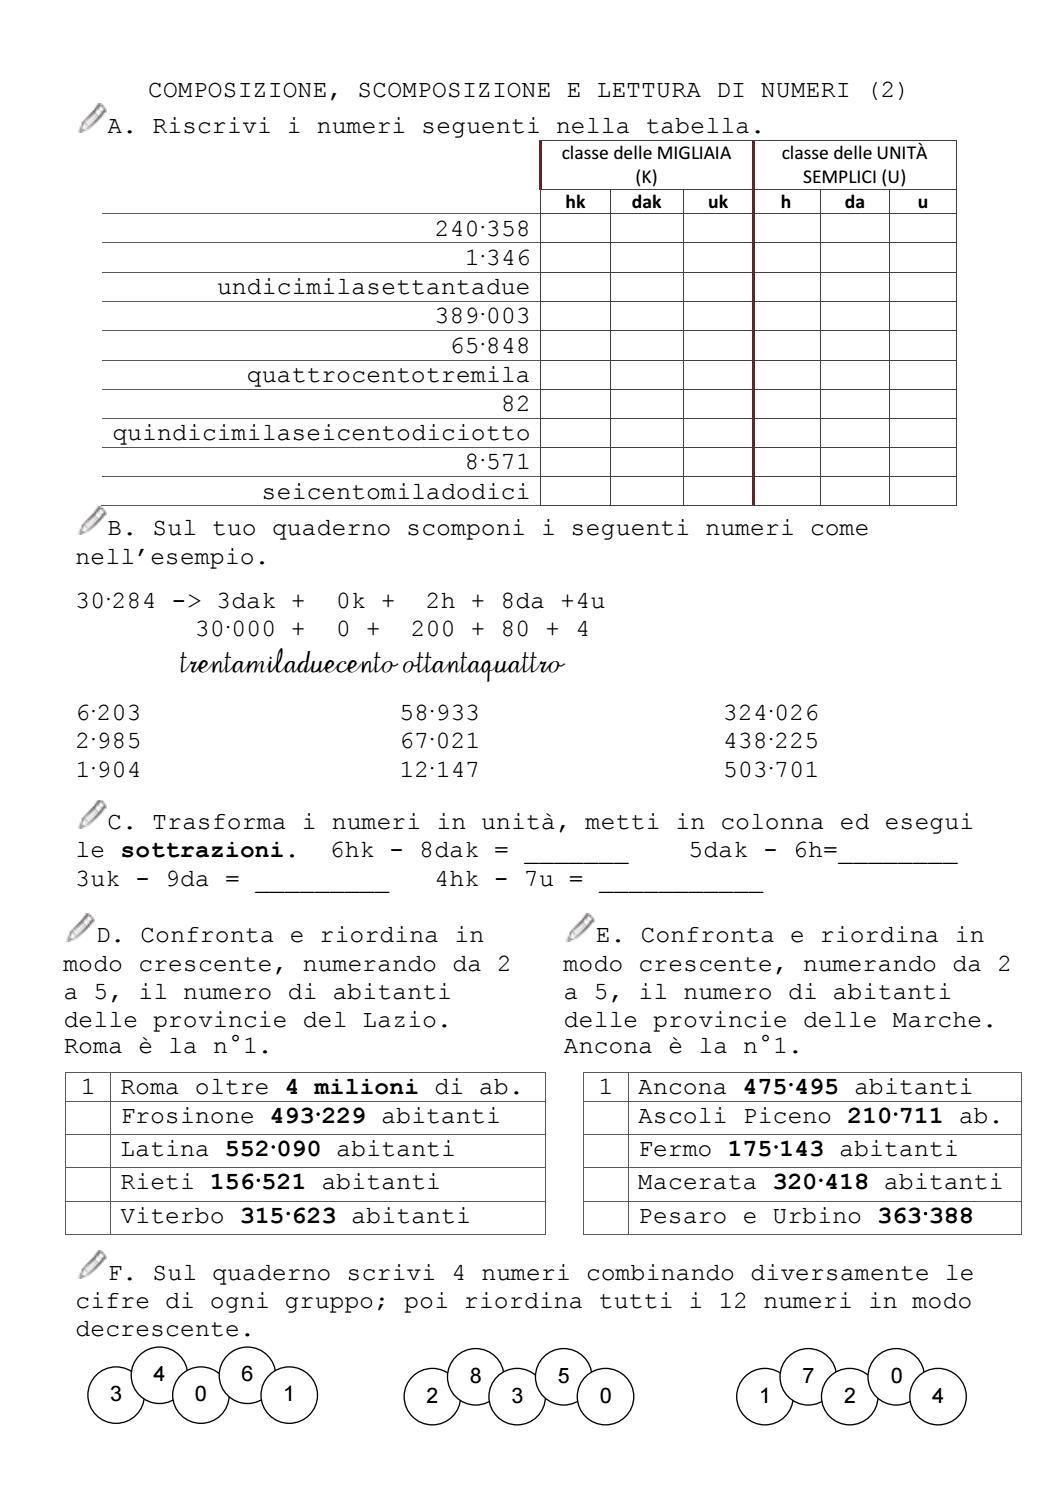 Composizioni Quapippoq Issuu Composizioni Scomposizioni Issuu Quapippoq By Scomposizioni Composizioni By 5j4A3RL